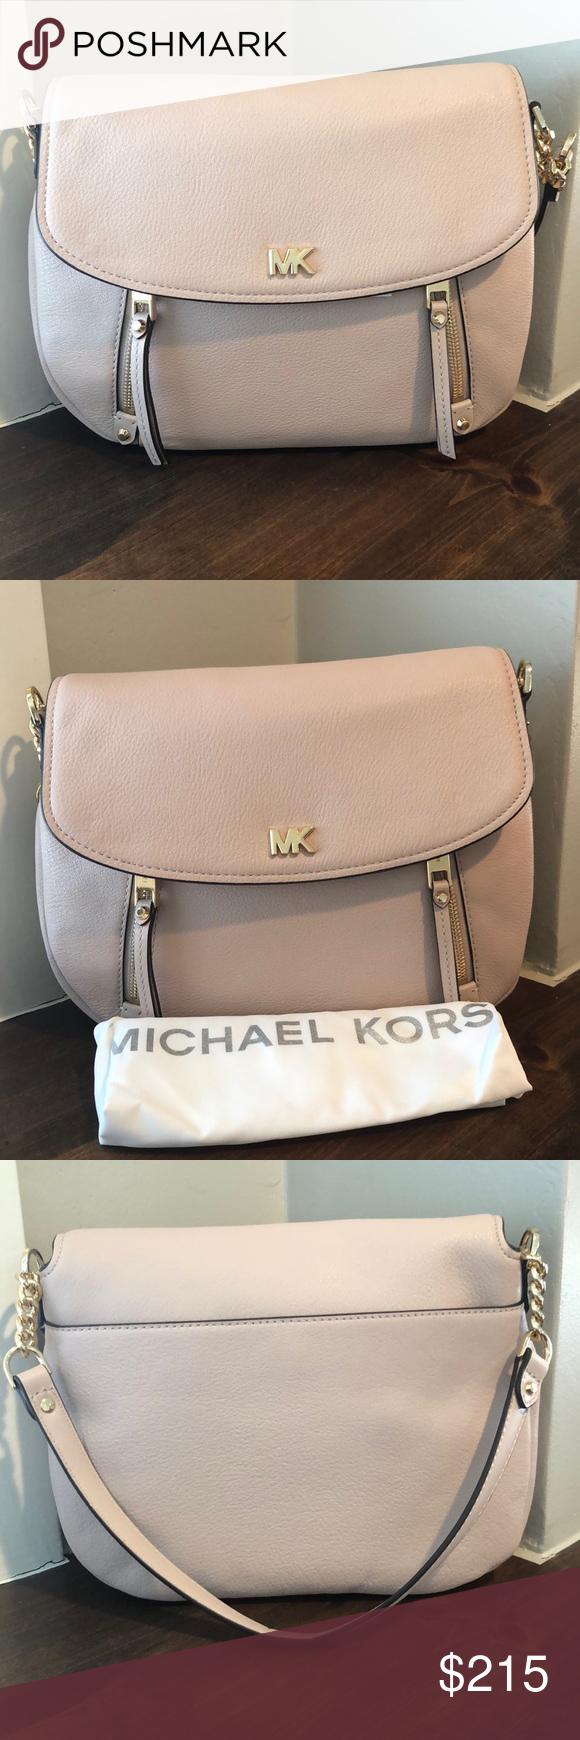 4d44c0b6b6c4e9 Michael Kors Evie soft pink MD shoulder flap bag New with tags attached!  Michael Kors